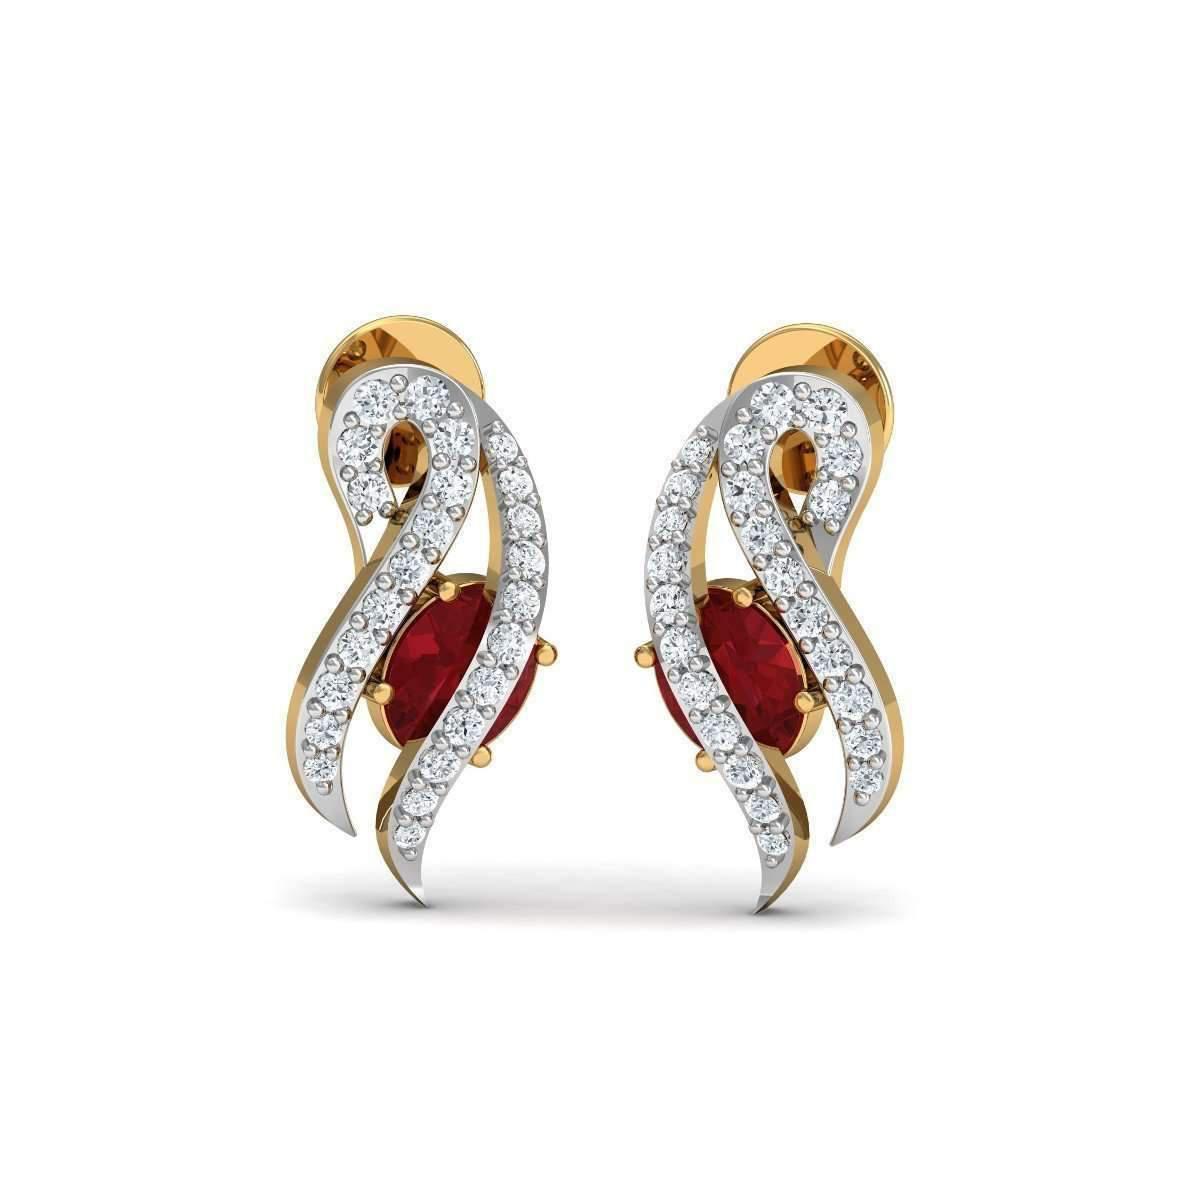 Diamoire Jewels Cachet 18kt White Gold Diamond Stud Earrings hIQgejBe